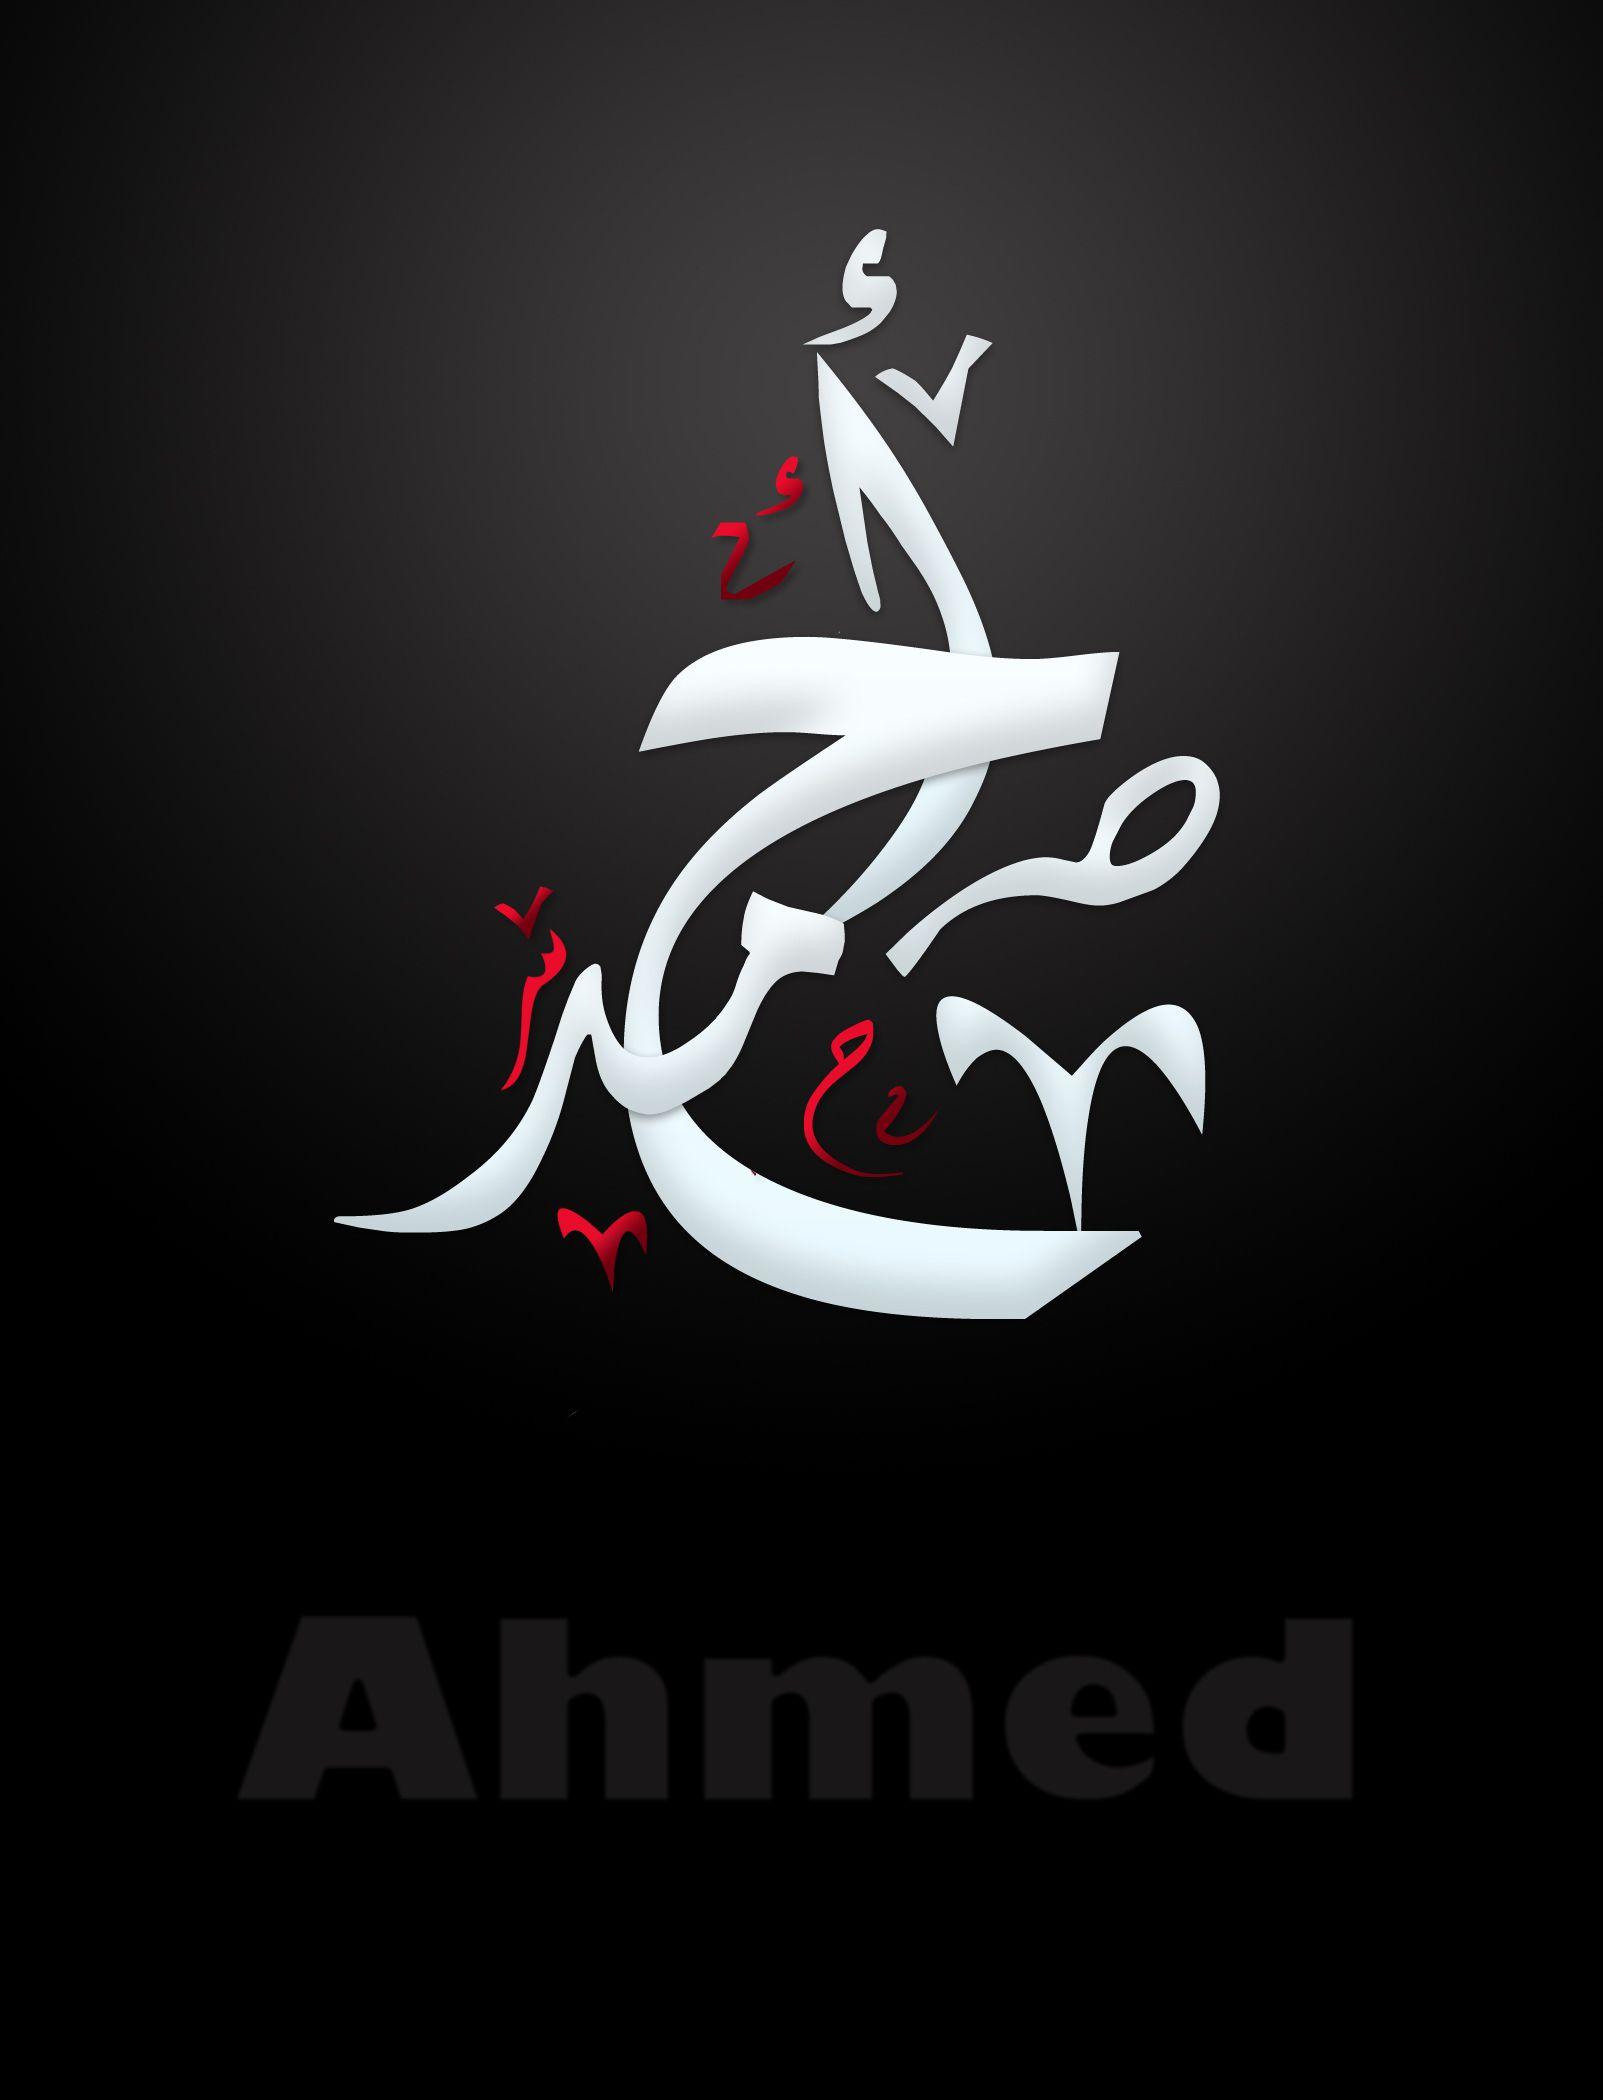 Ahmed أحمد Calligraphy Art Islamic Art Calligraphy Islamic Calligraphy Painting